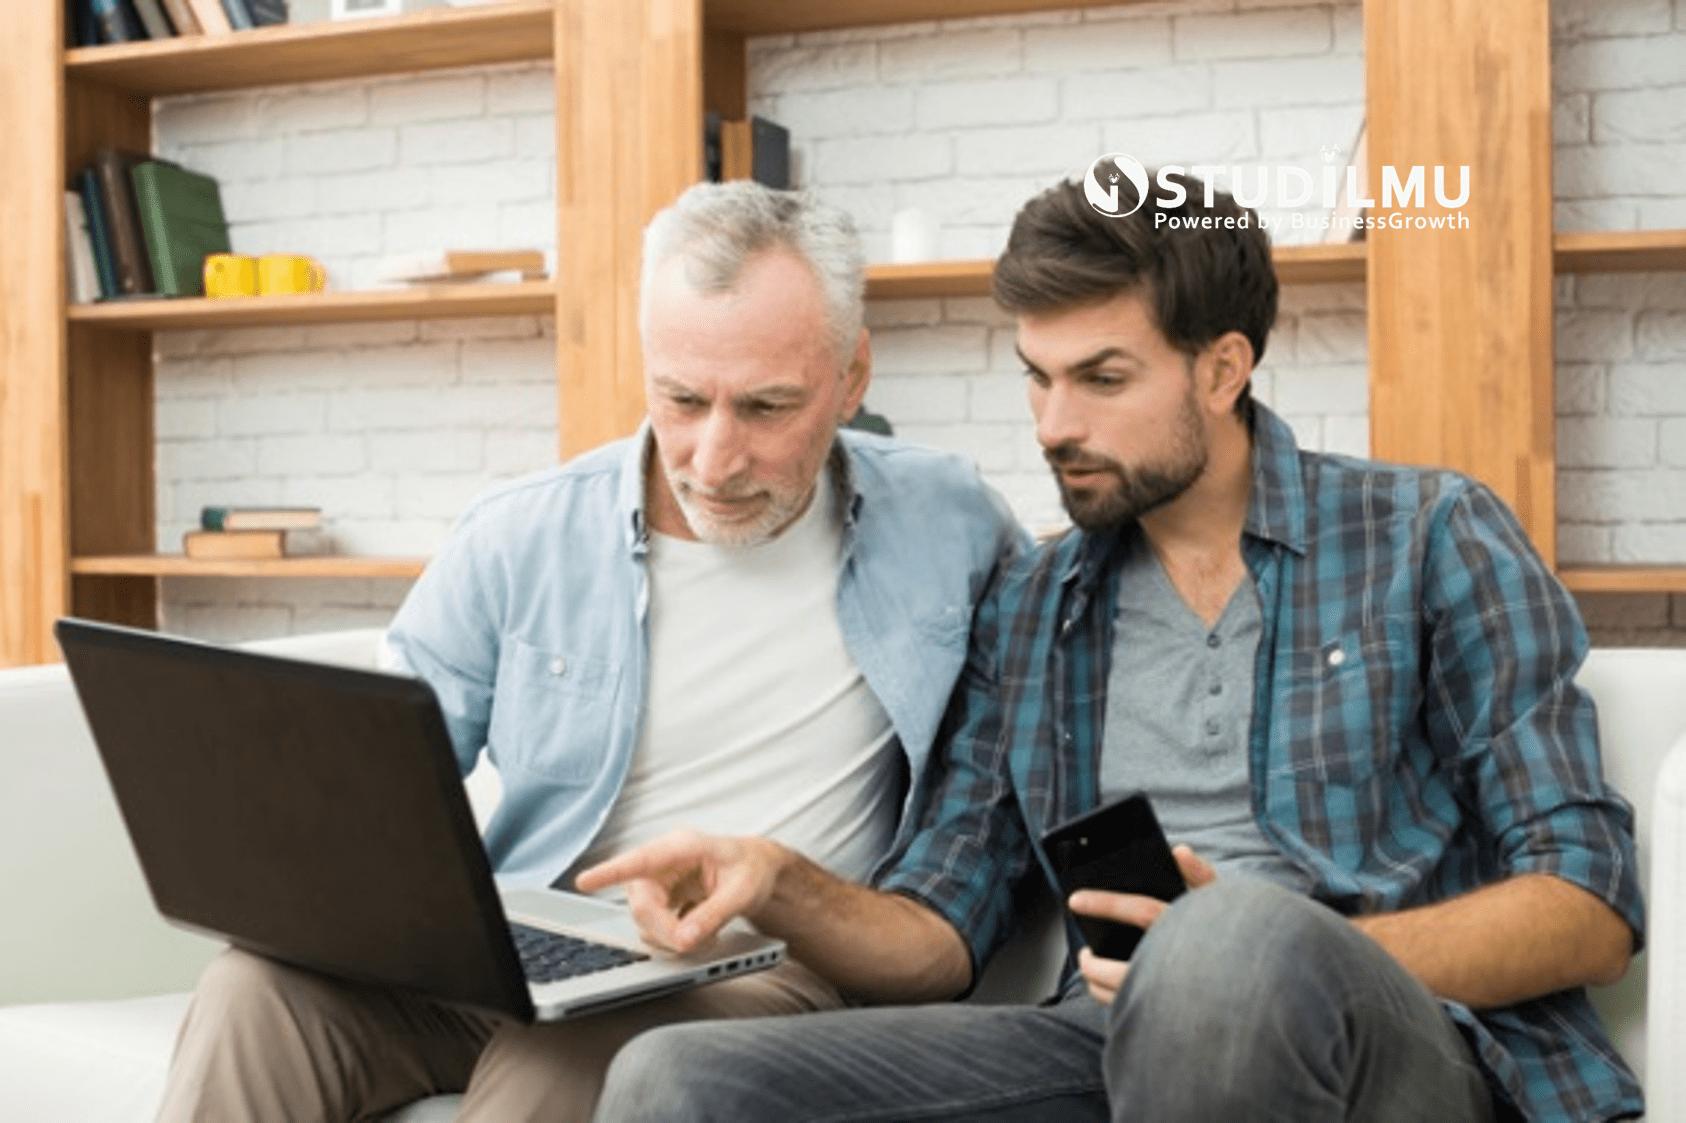 STUDILMU Career Advice - Lingkungan Kerja Multigenerasi